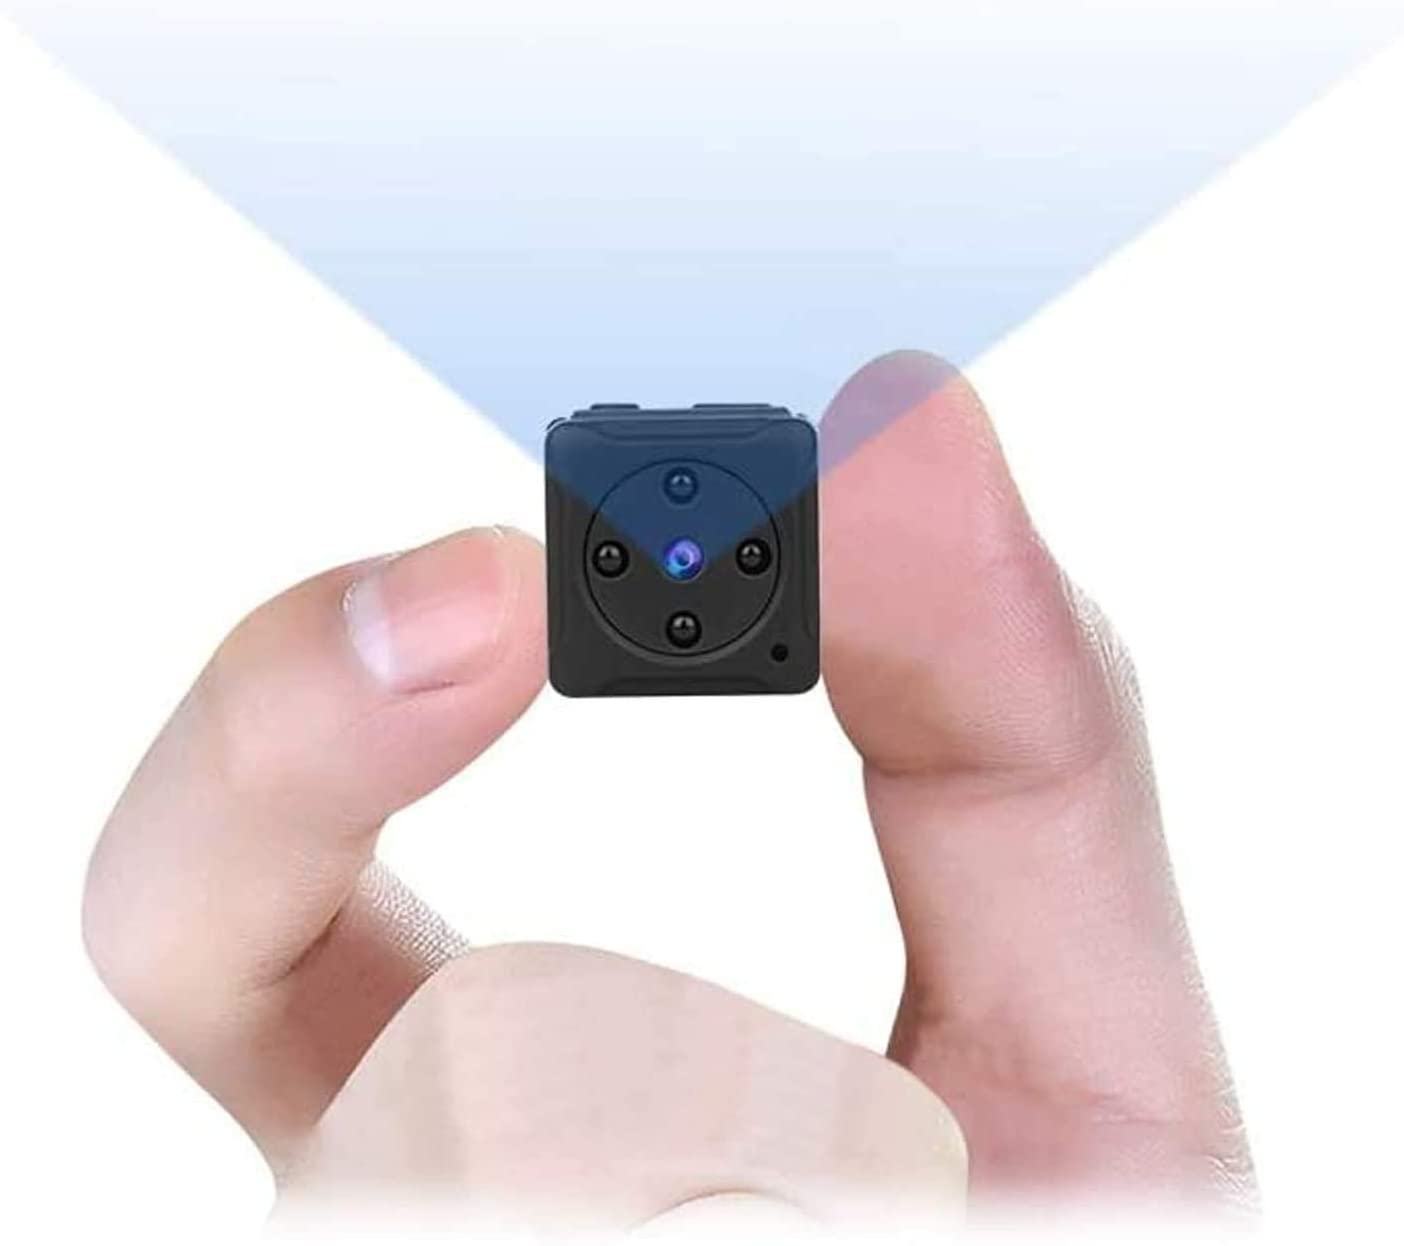 Mini Spy Camera Wireless Hidden Small Nanny Cam Micro Security Pinhole Covert Cameras Hd 1080P Night Vision For Home Outdoor Recording